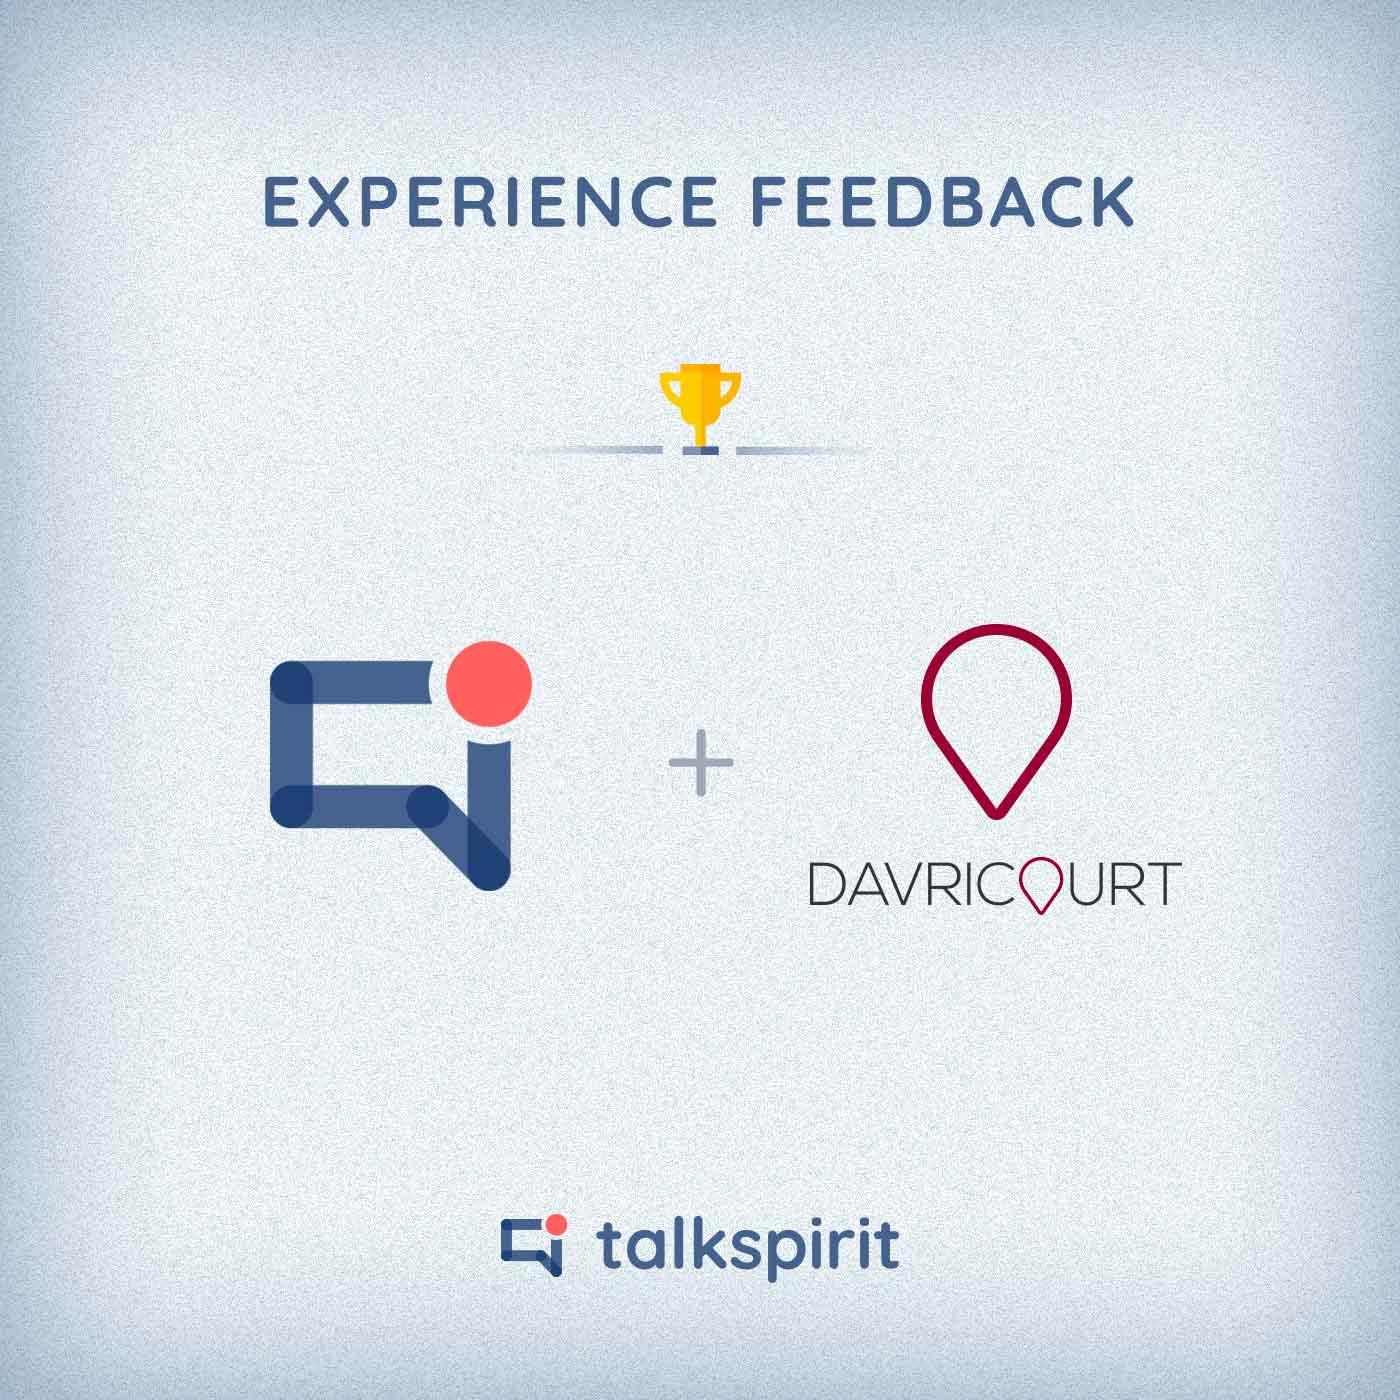 experience feedback talkspirit davricourt